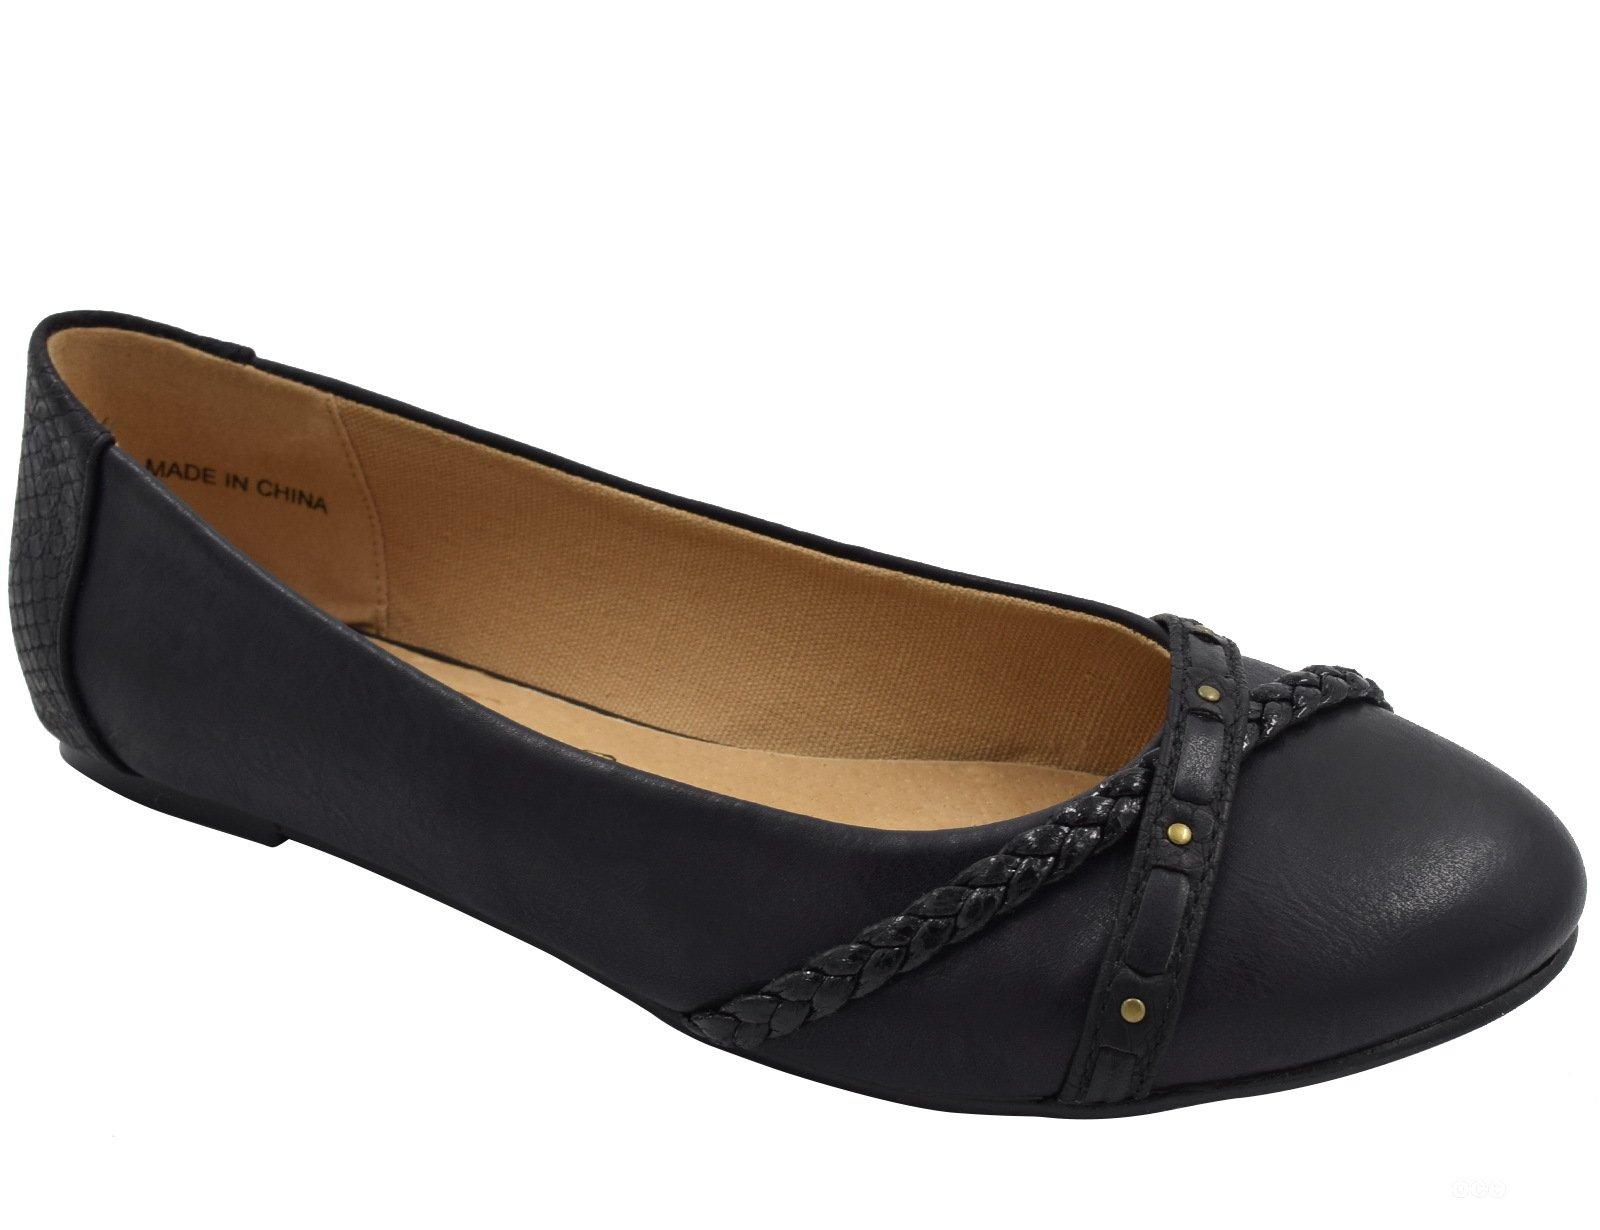 Greatonu Slip On Closed Toe Ballet Flats Black Dress Shoes Size 10